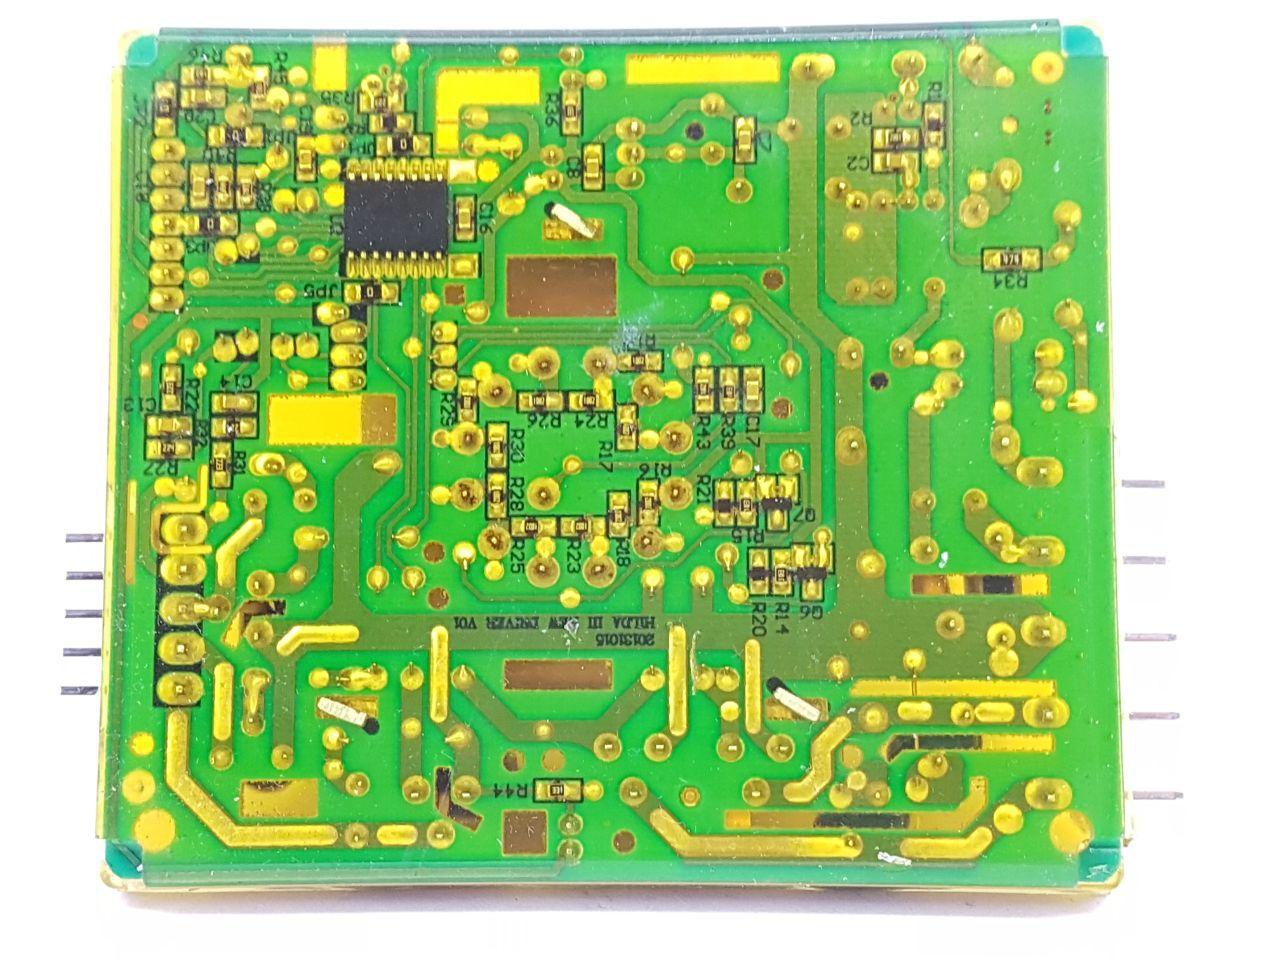 Placa Eletrônica Electrolux Lte07 70202144 Original Bivolt